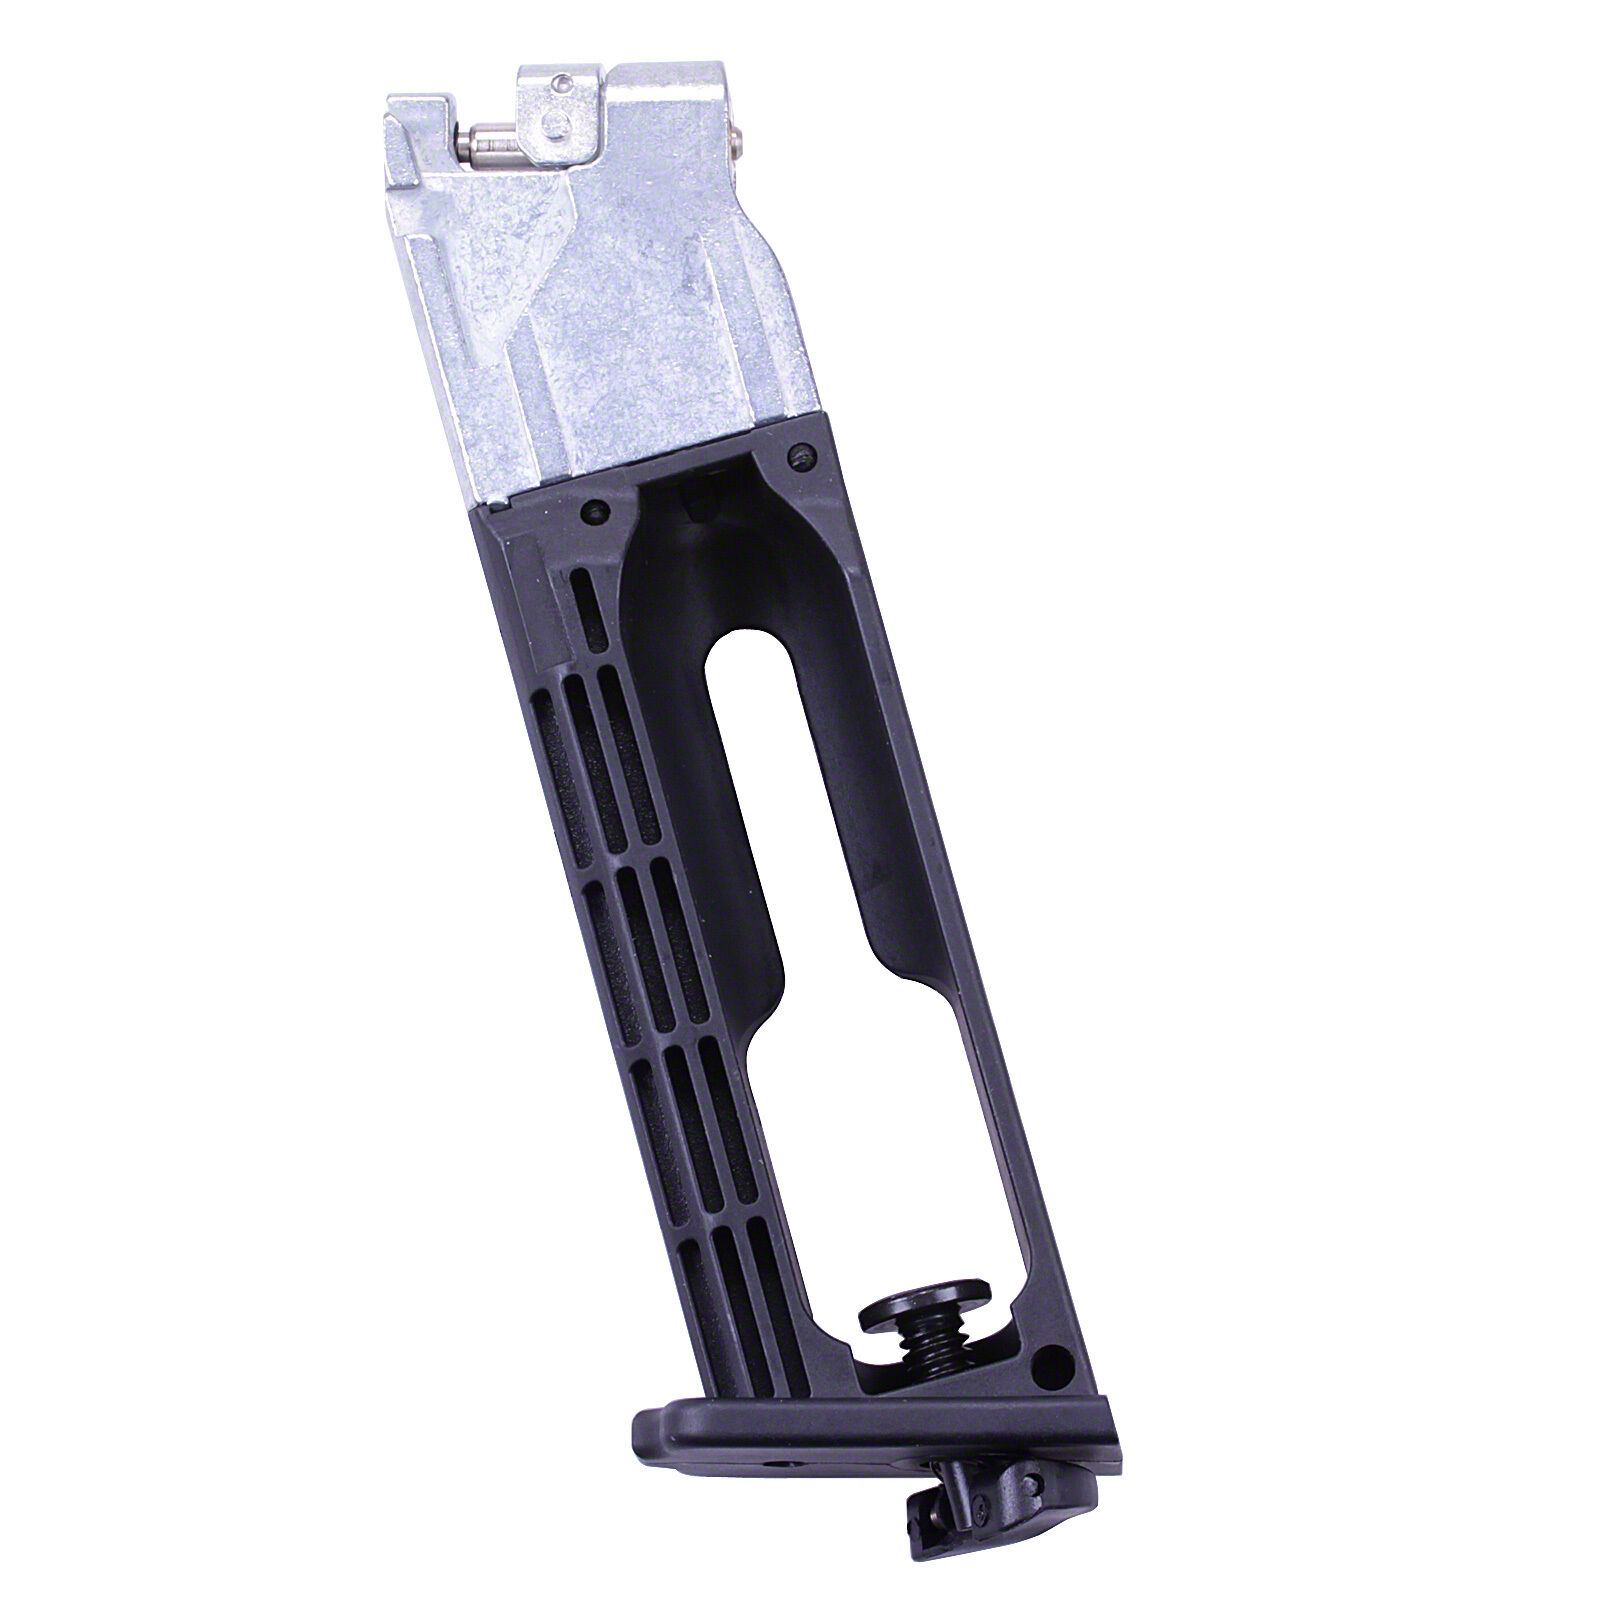 Umarex bruning Hi Power Mark 3 Magazine Mag 4.5mm BBs Co2 Pistol 5.838.1